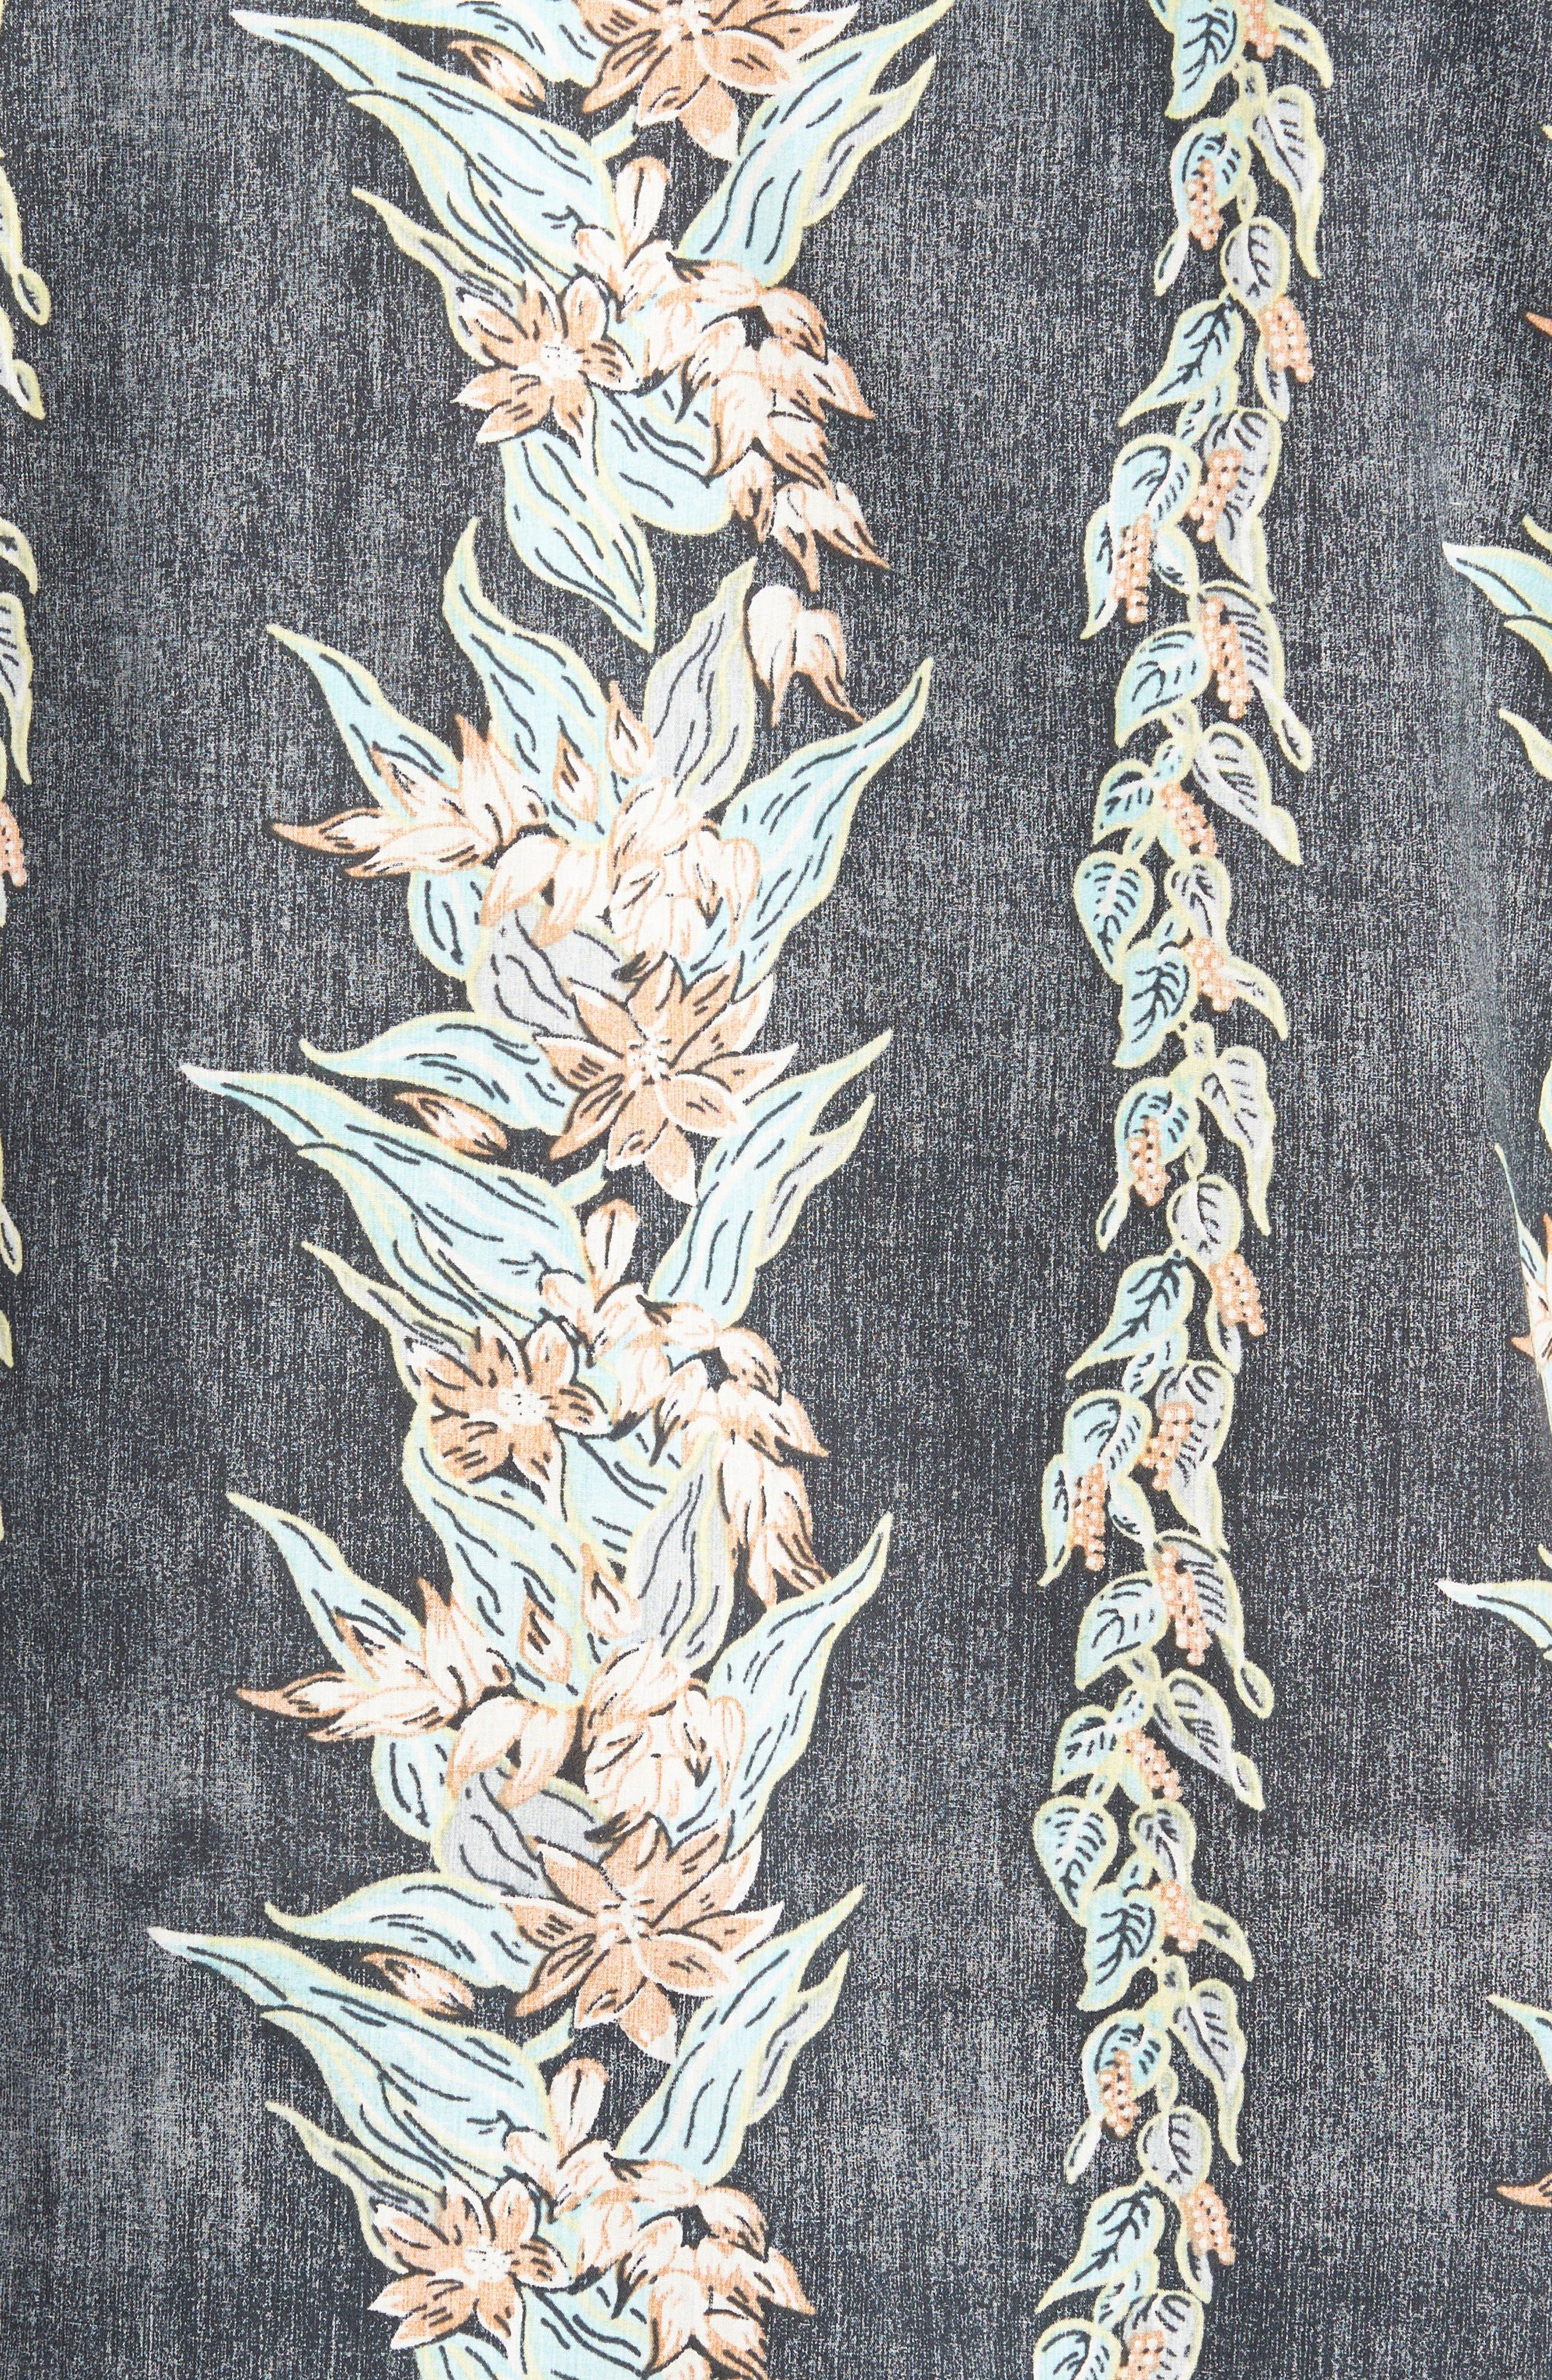 Sundays Floral Woven Shirt,                             Alternate thumbnail 5, color,                             010